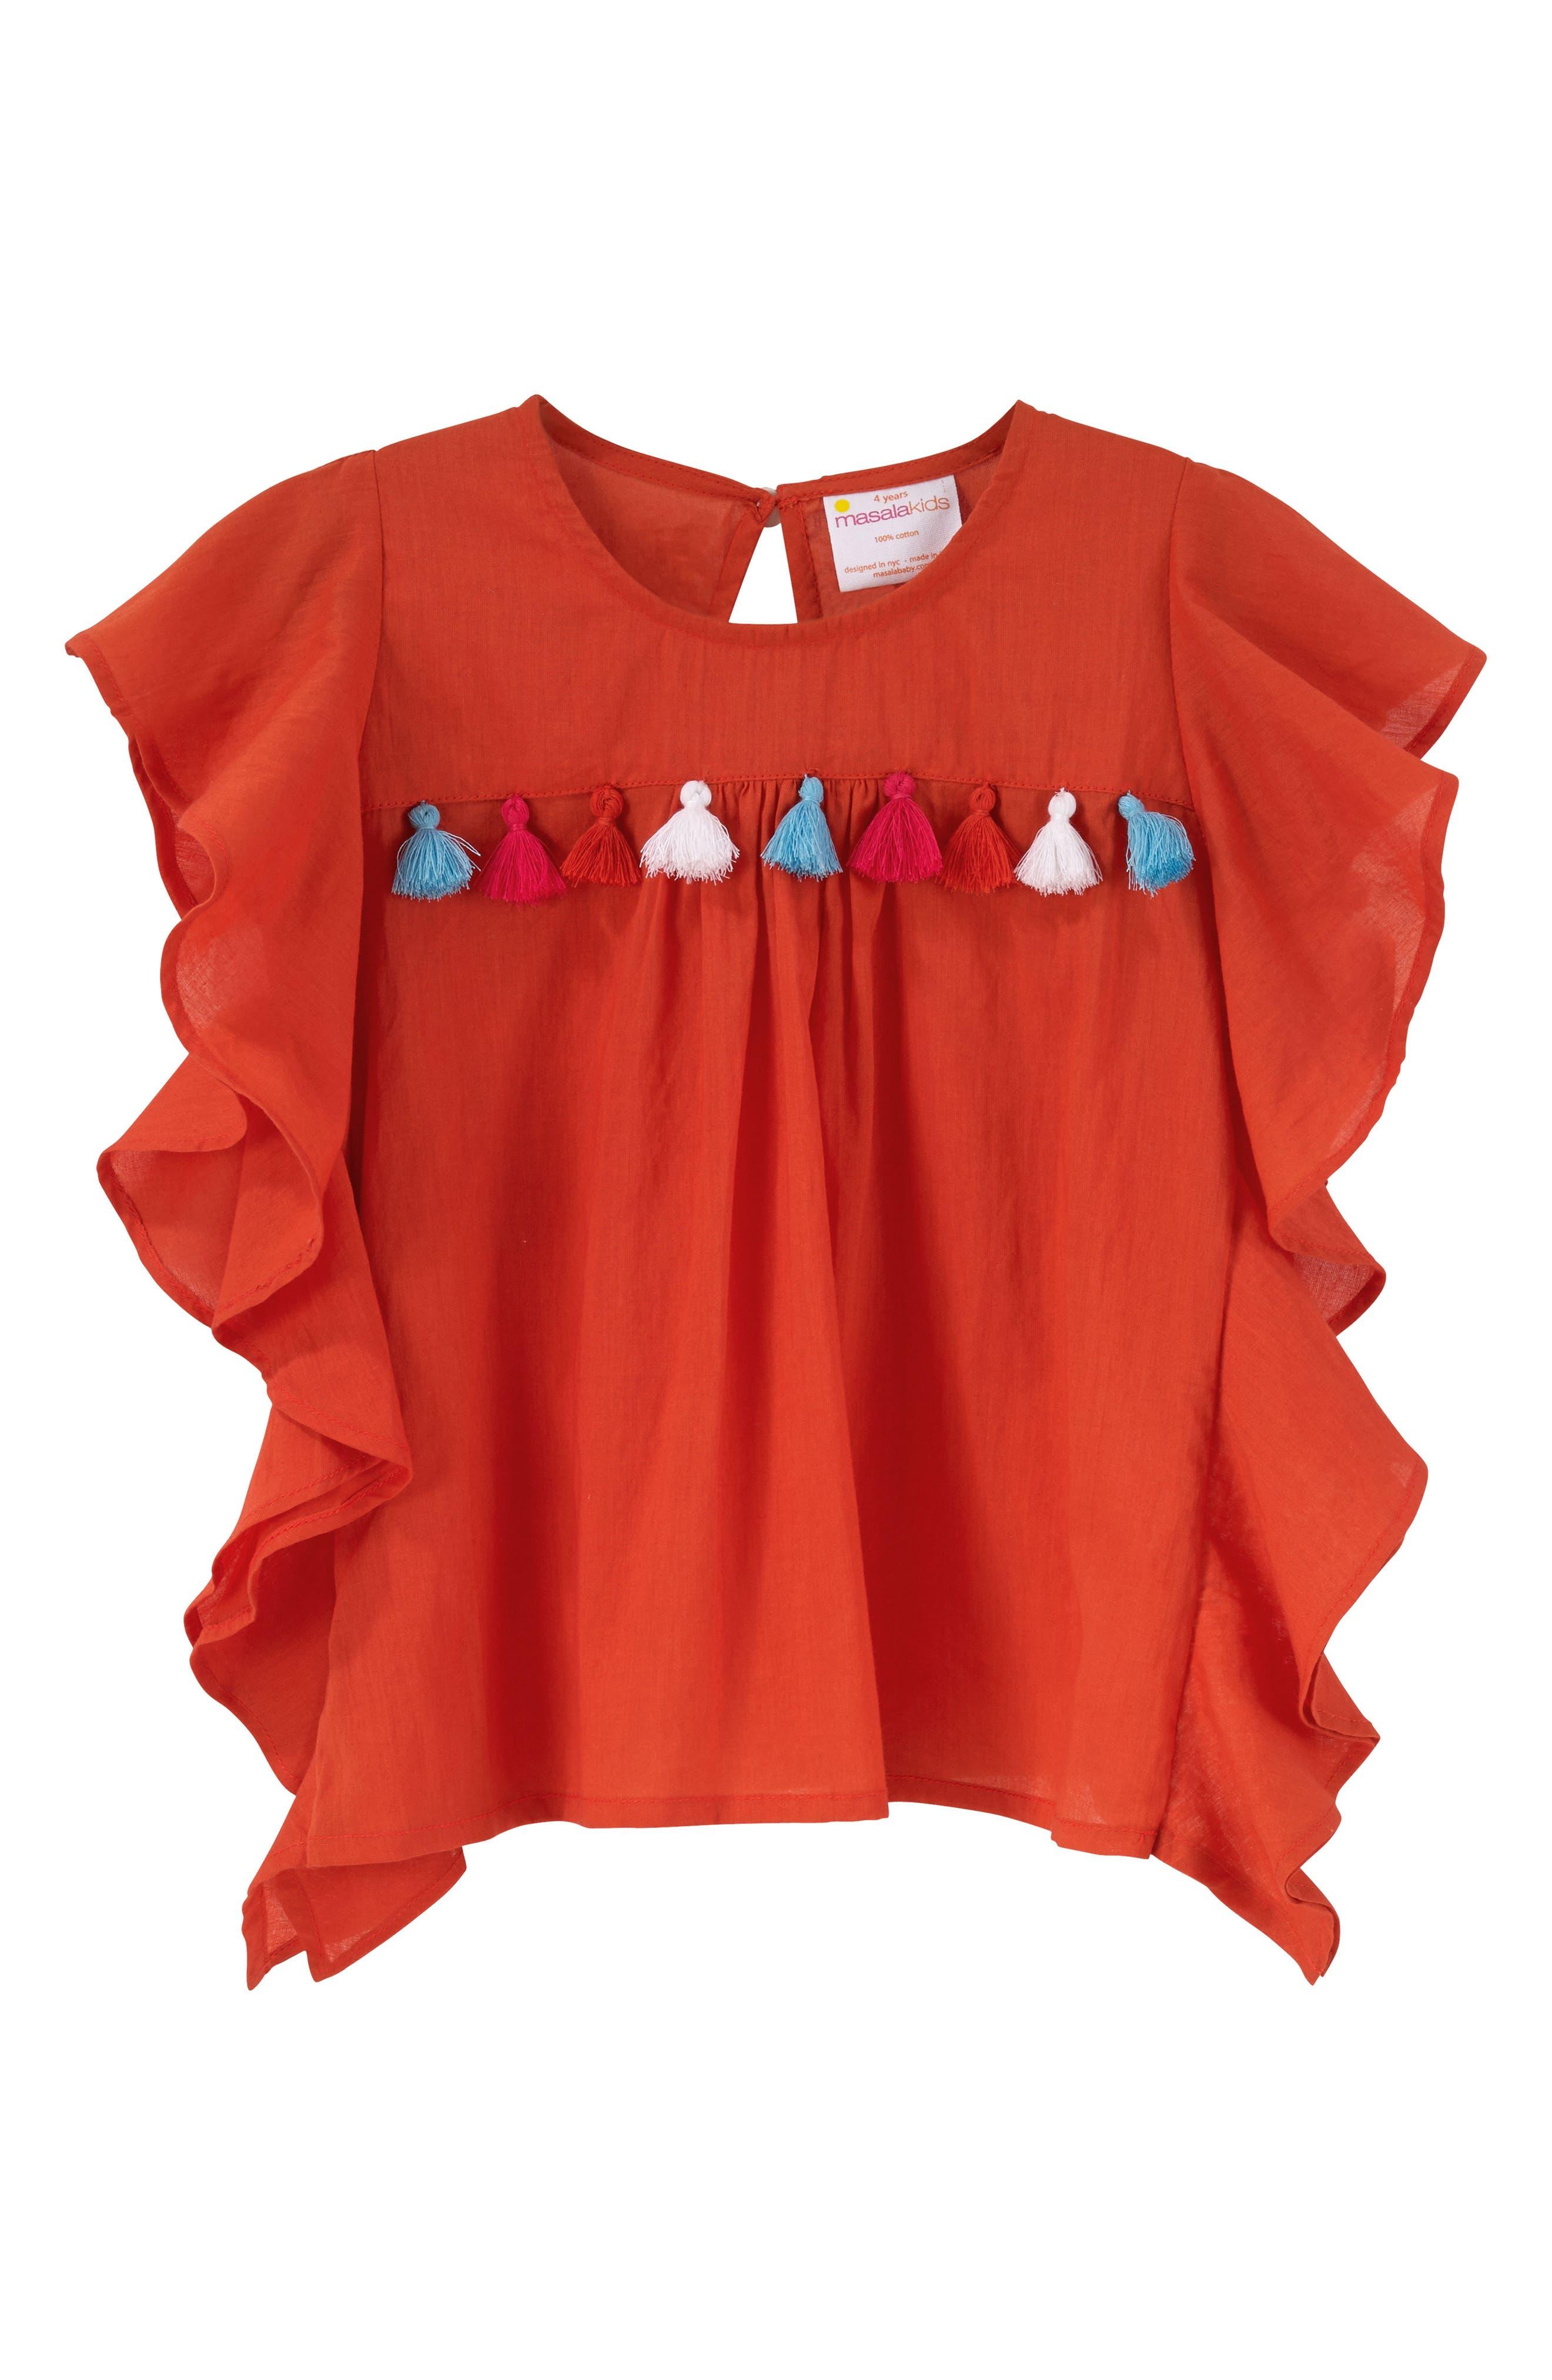 Alternate Image 1 Selected - Masala Baby Wave Ruffle Top (Toddler Girls, Little Girls & Big Girls)